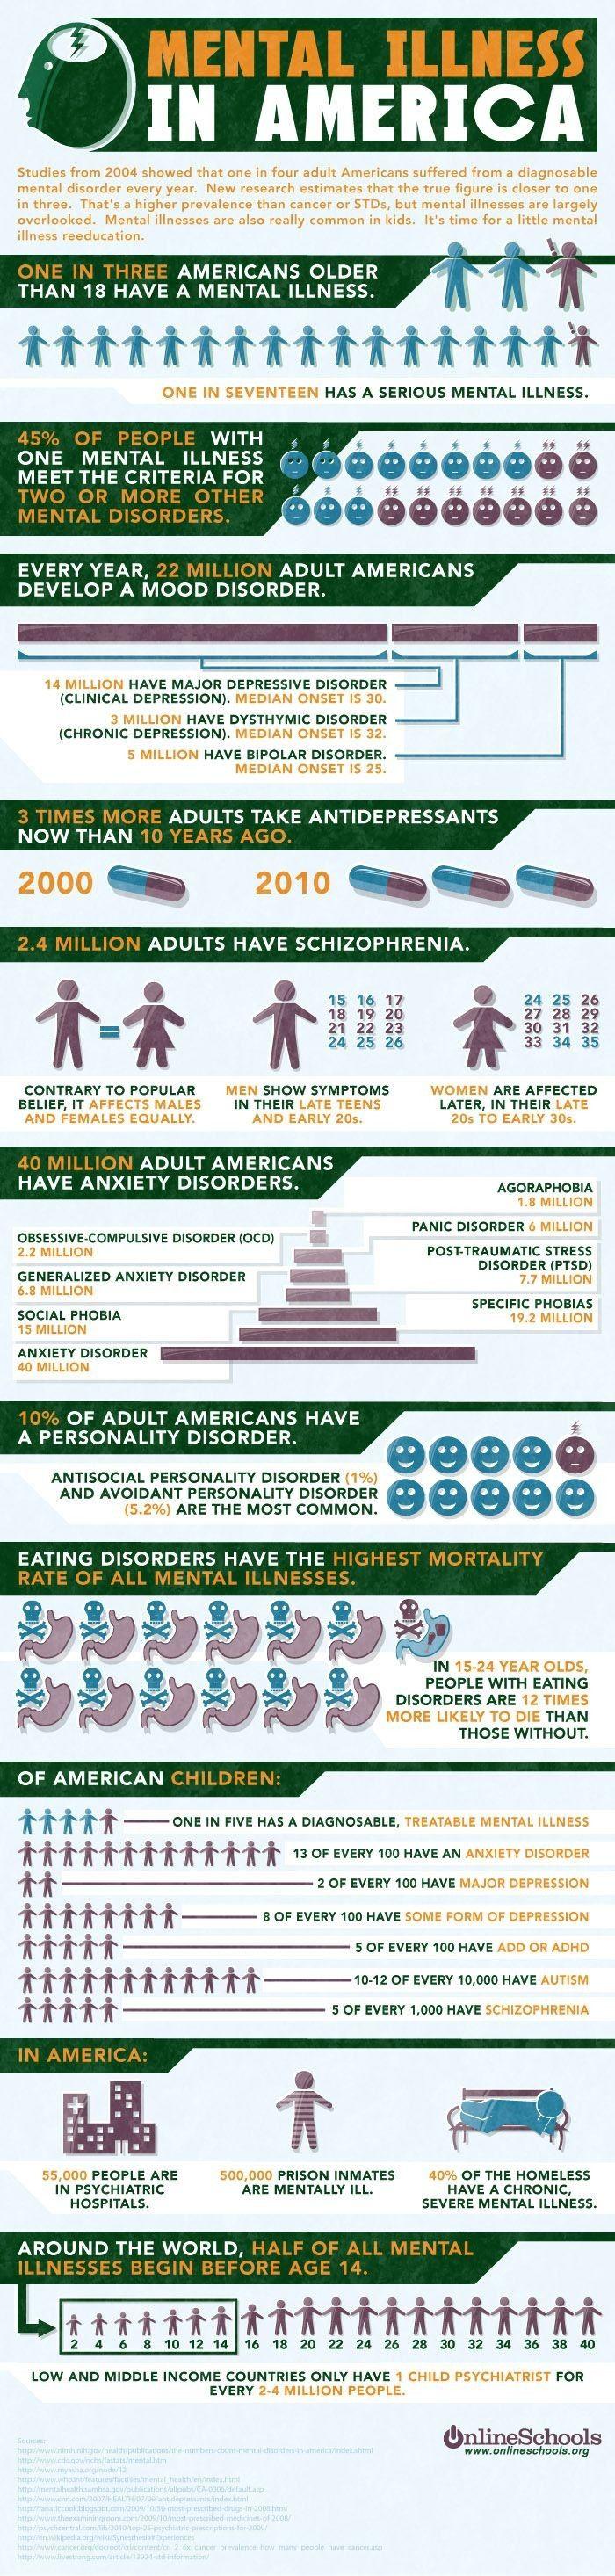 Mental health disorders in America